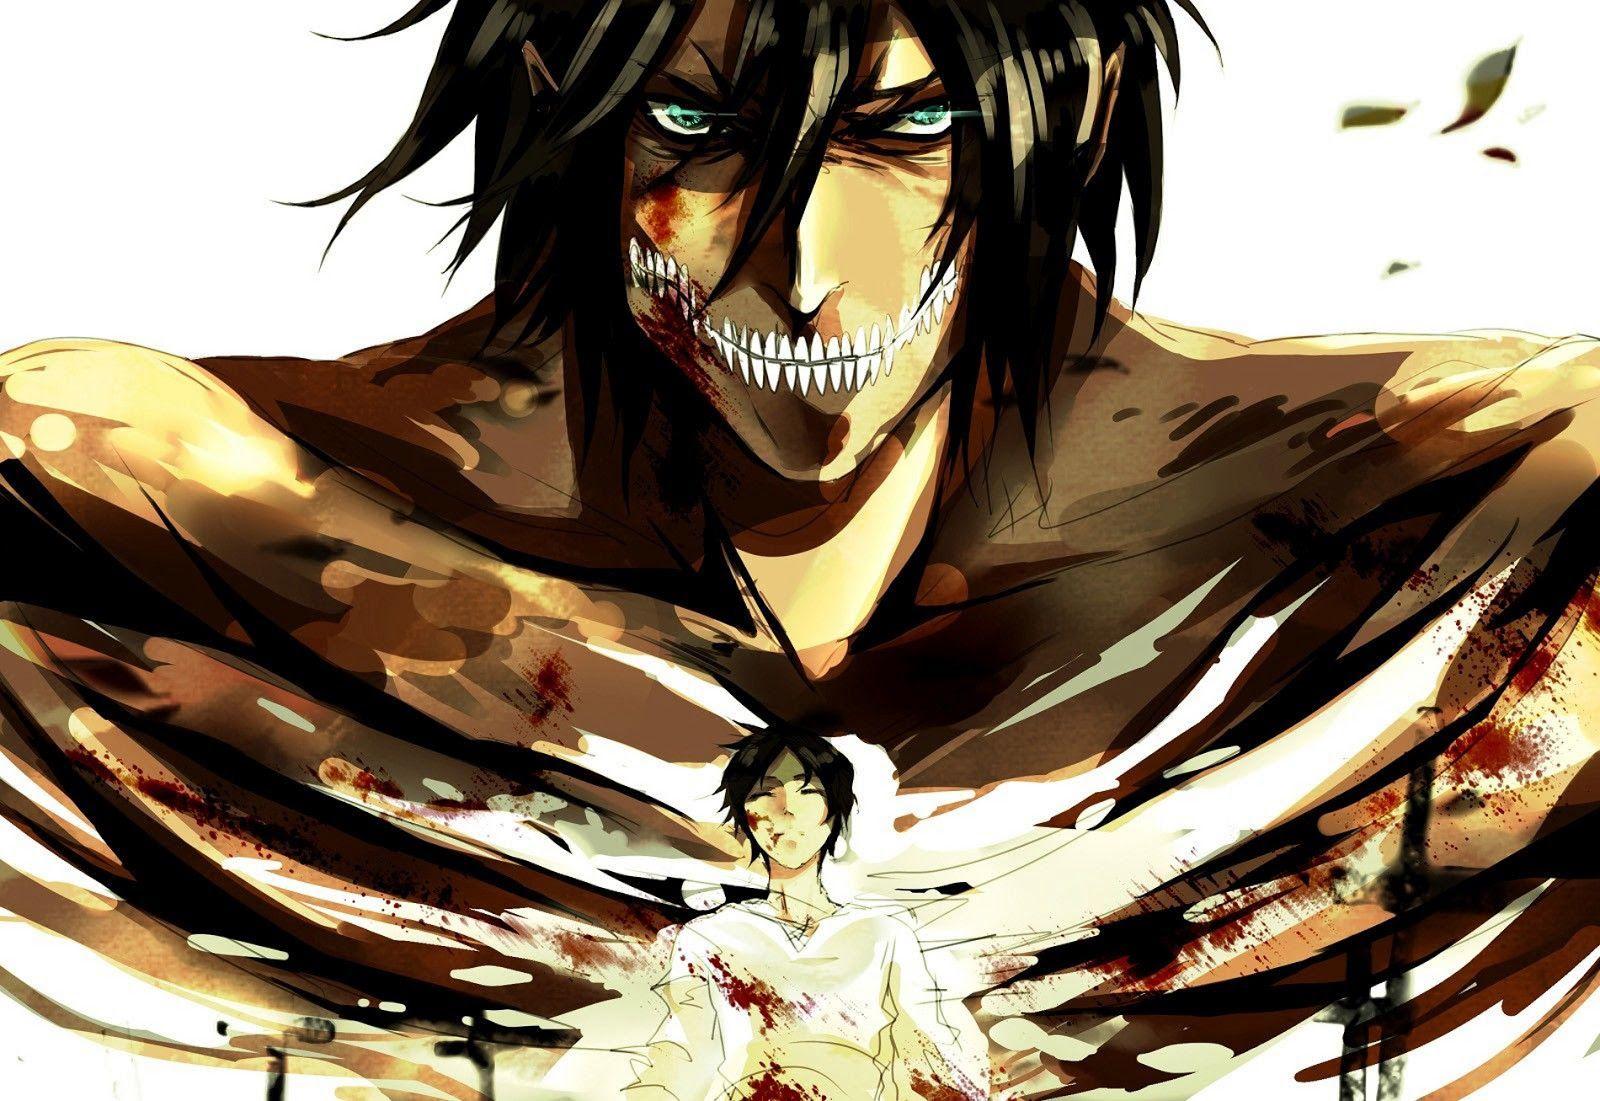 No Kyojin Attack On Titan Anime Hd Wallpaper Desktop Background Attack On Titan Season Attack On Titan Art Attack On Titan Eren